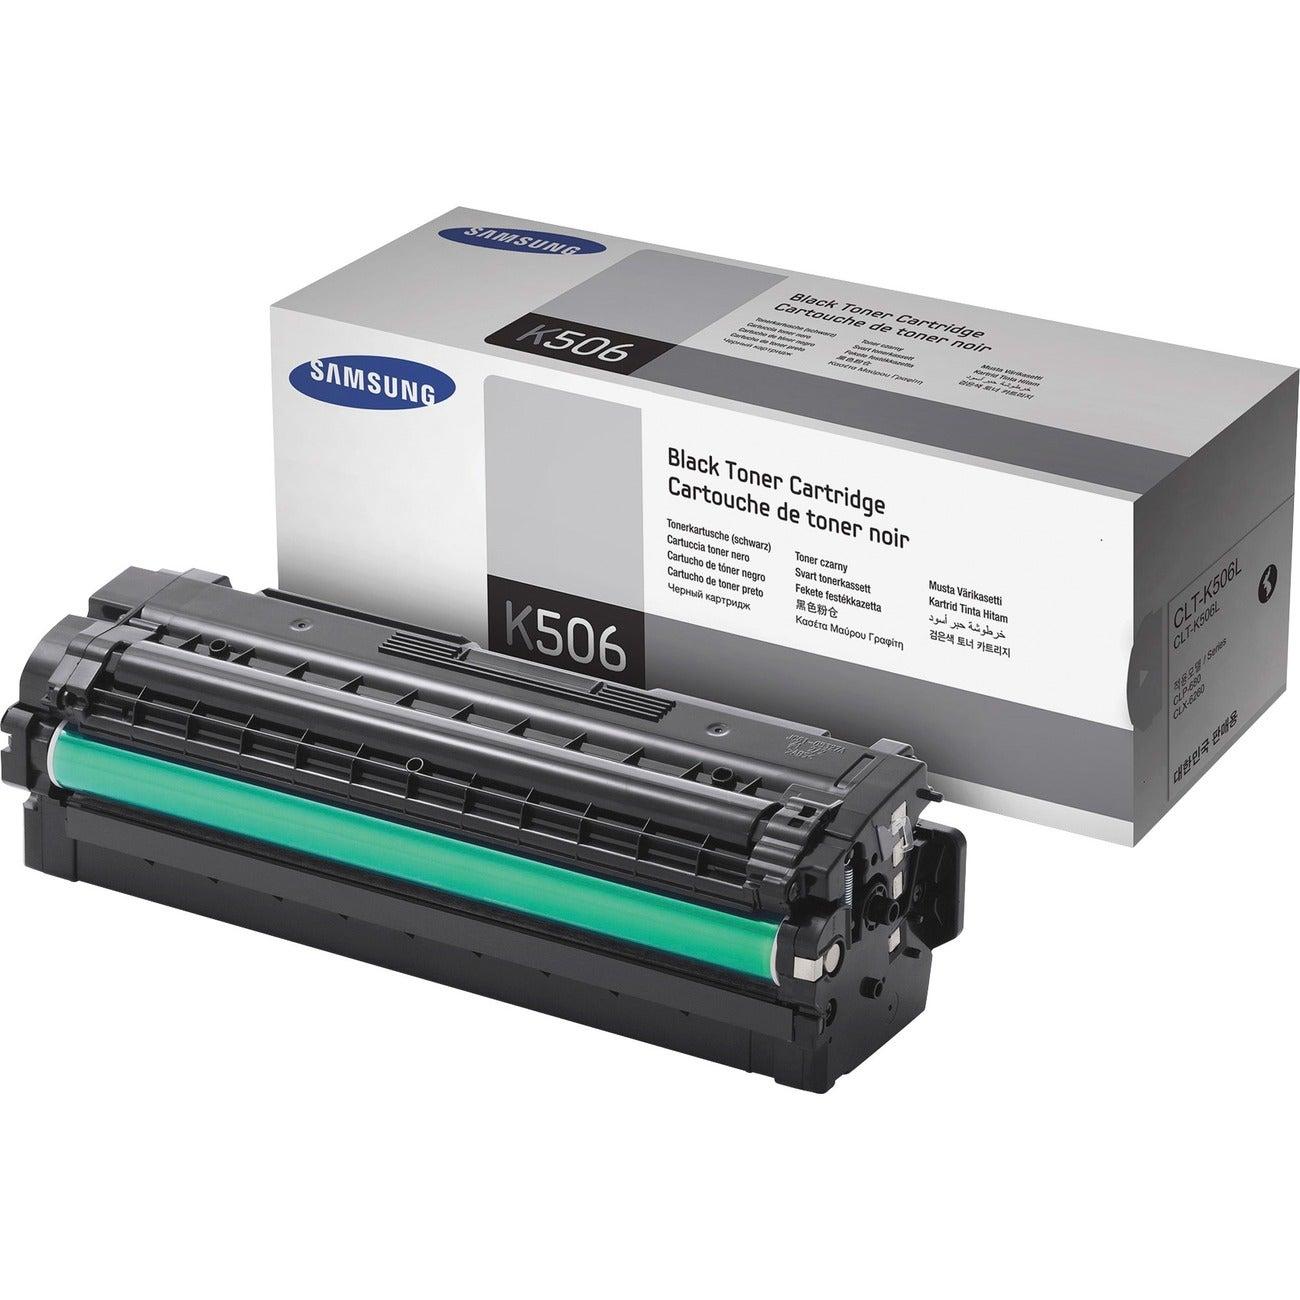 Samsung CLT-K506L Toner Cartridge - Black